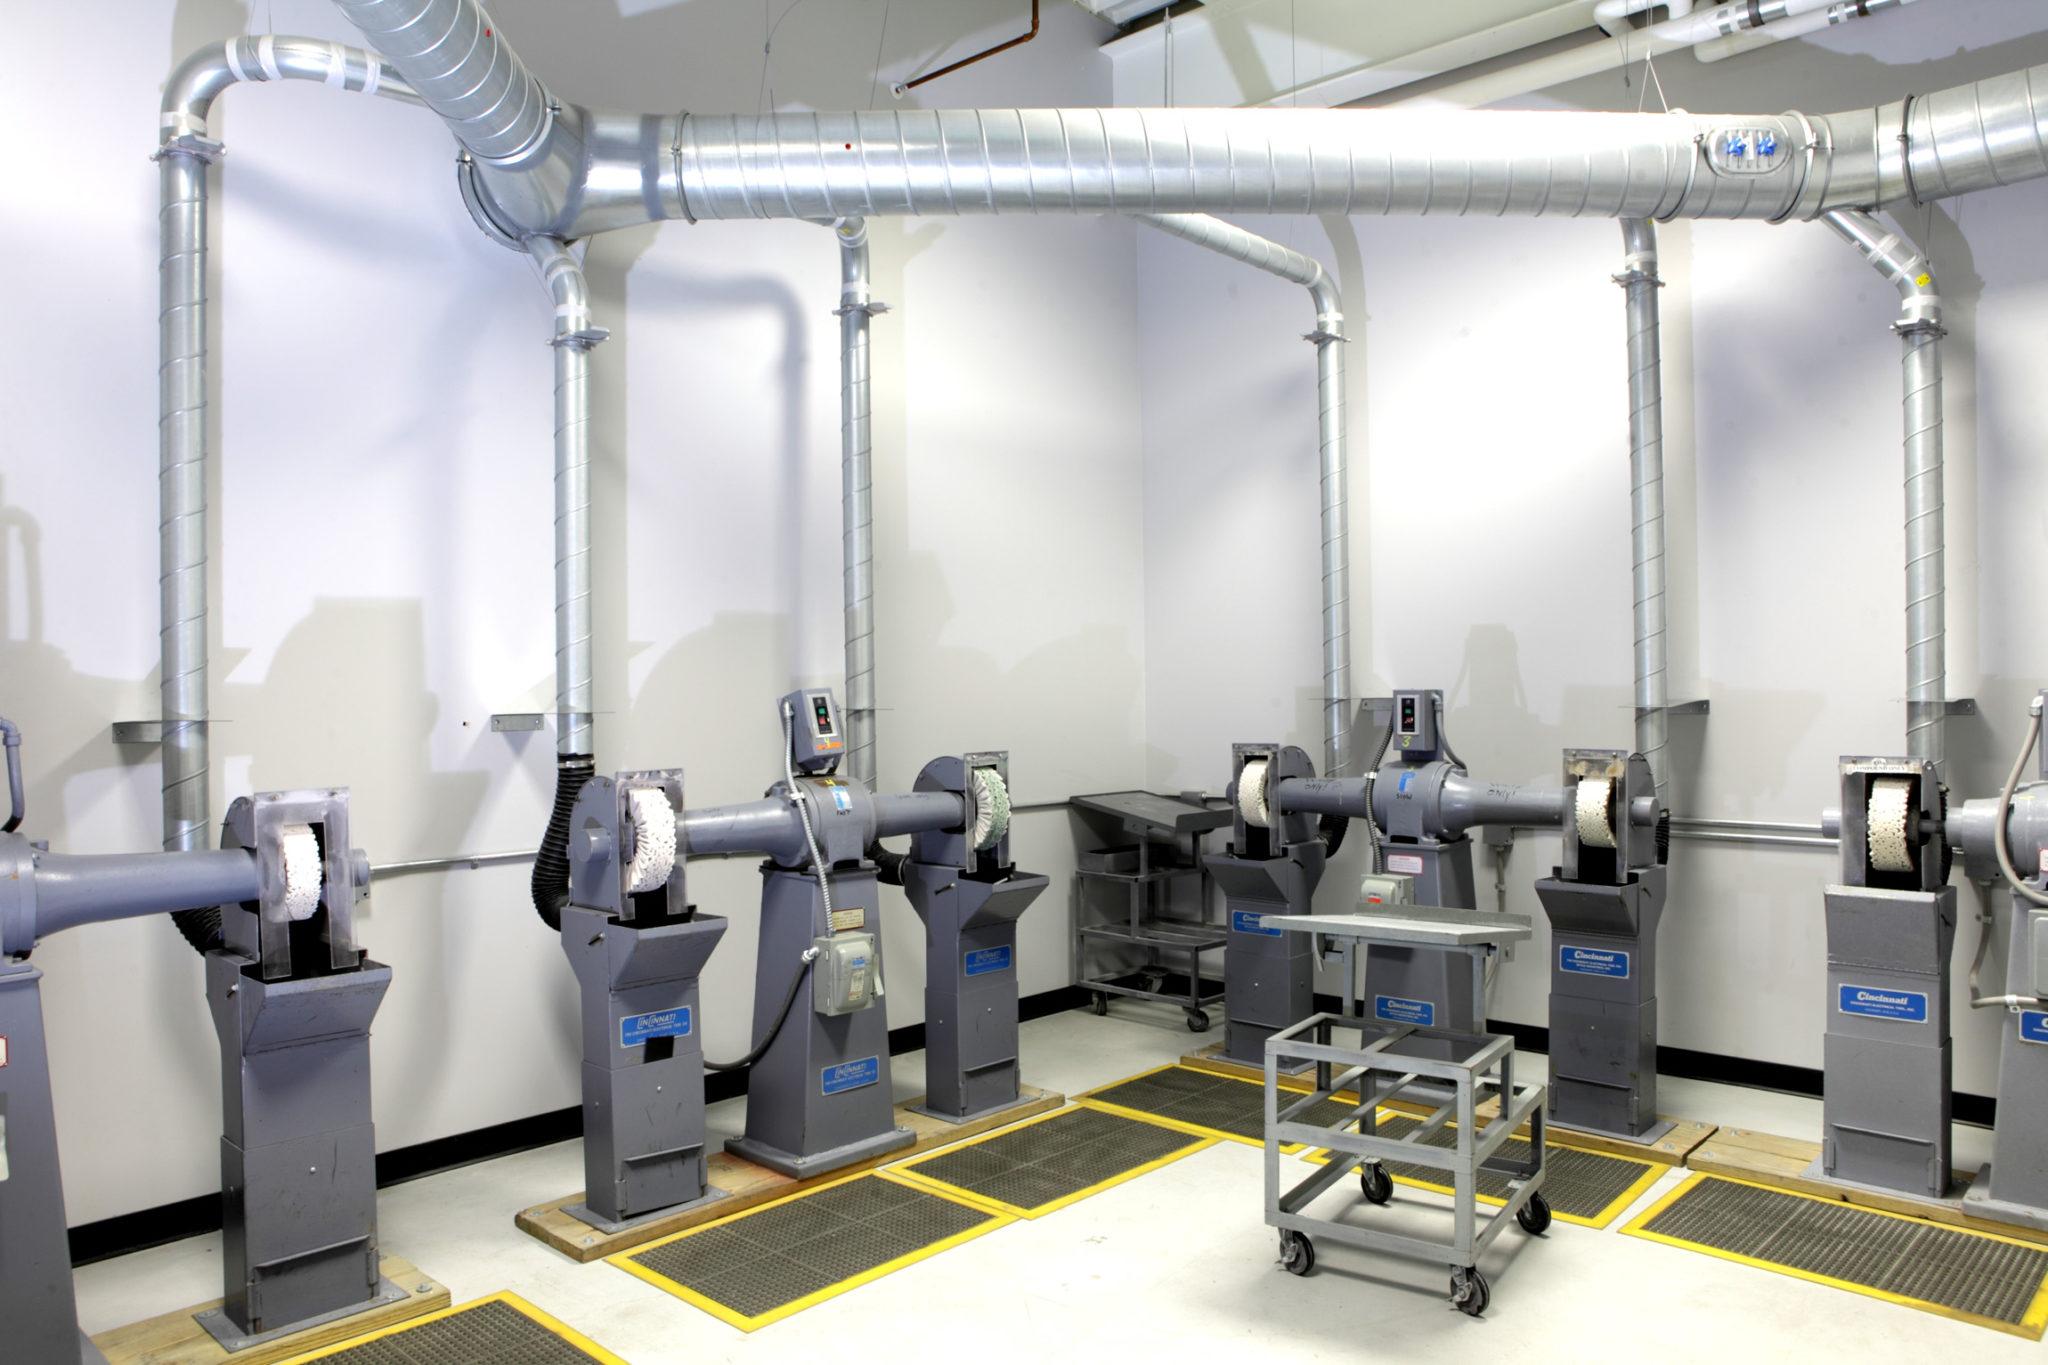 Commercial Mechnical Services Minneapolis St Paul Minnesota